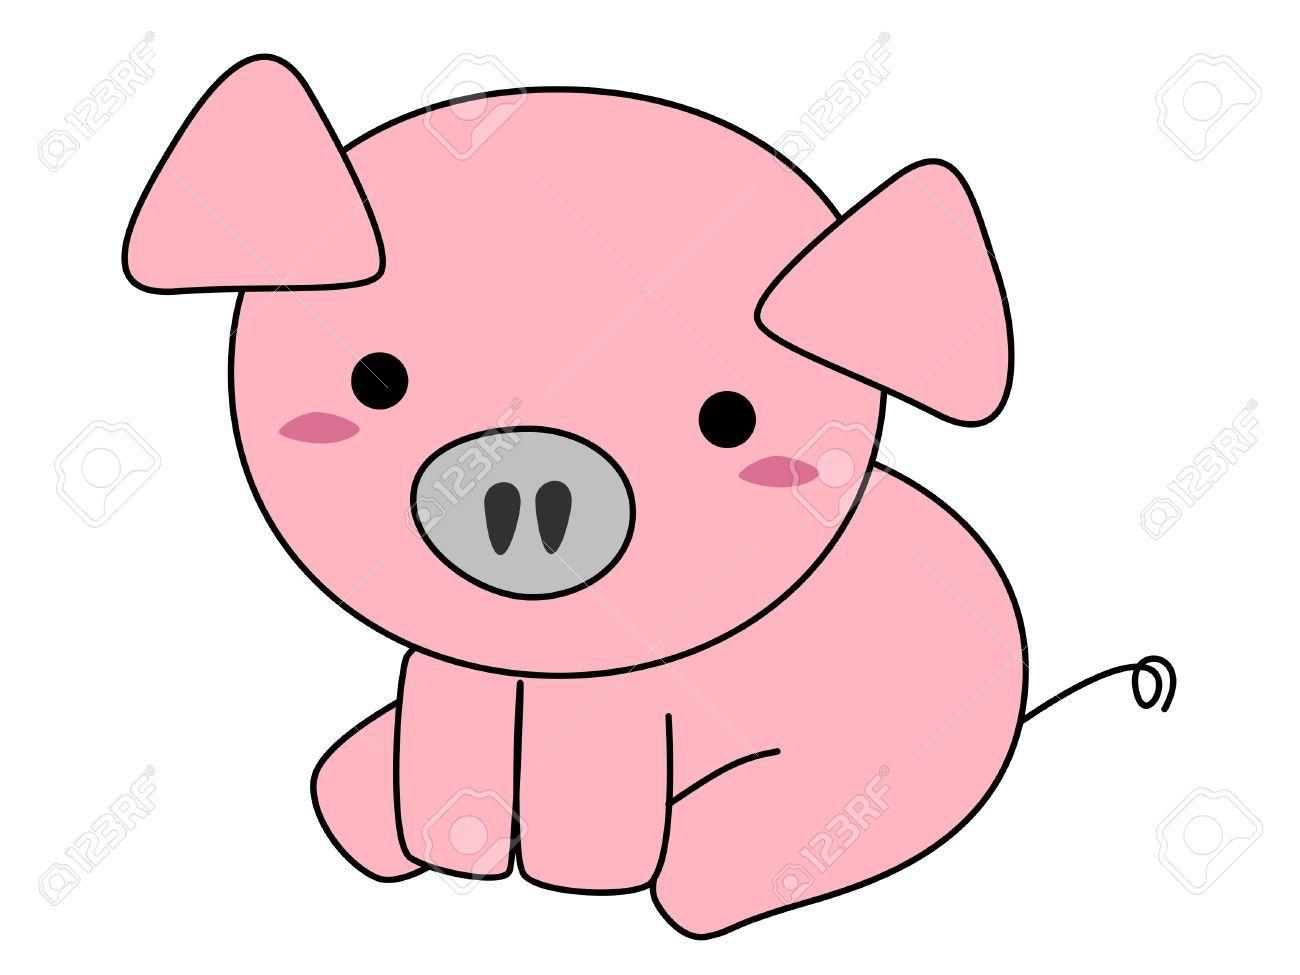 cute cartoon pigs wallpaper version - photo #41